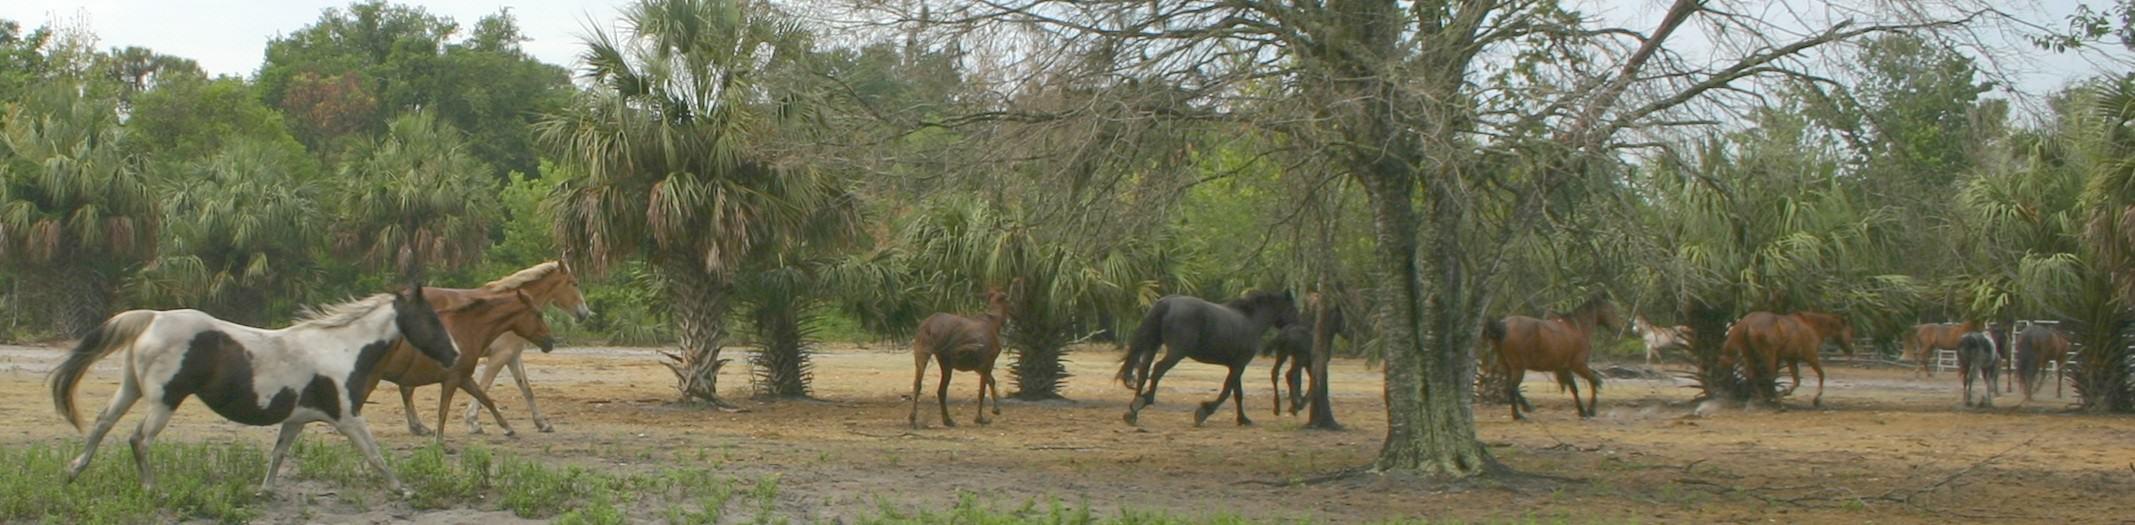 Horseback Hourly Rental | Suncitystables com: Florida Trail